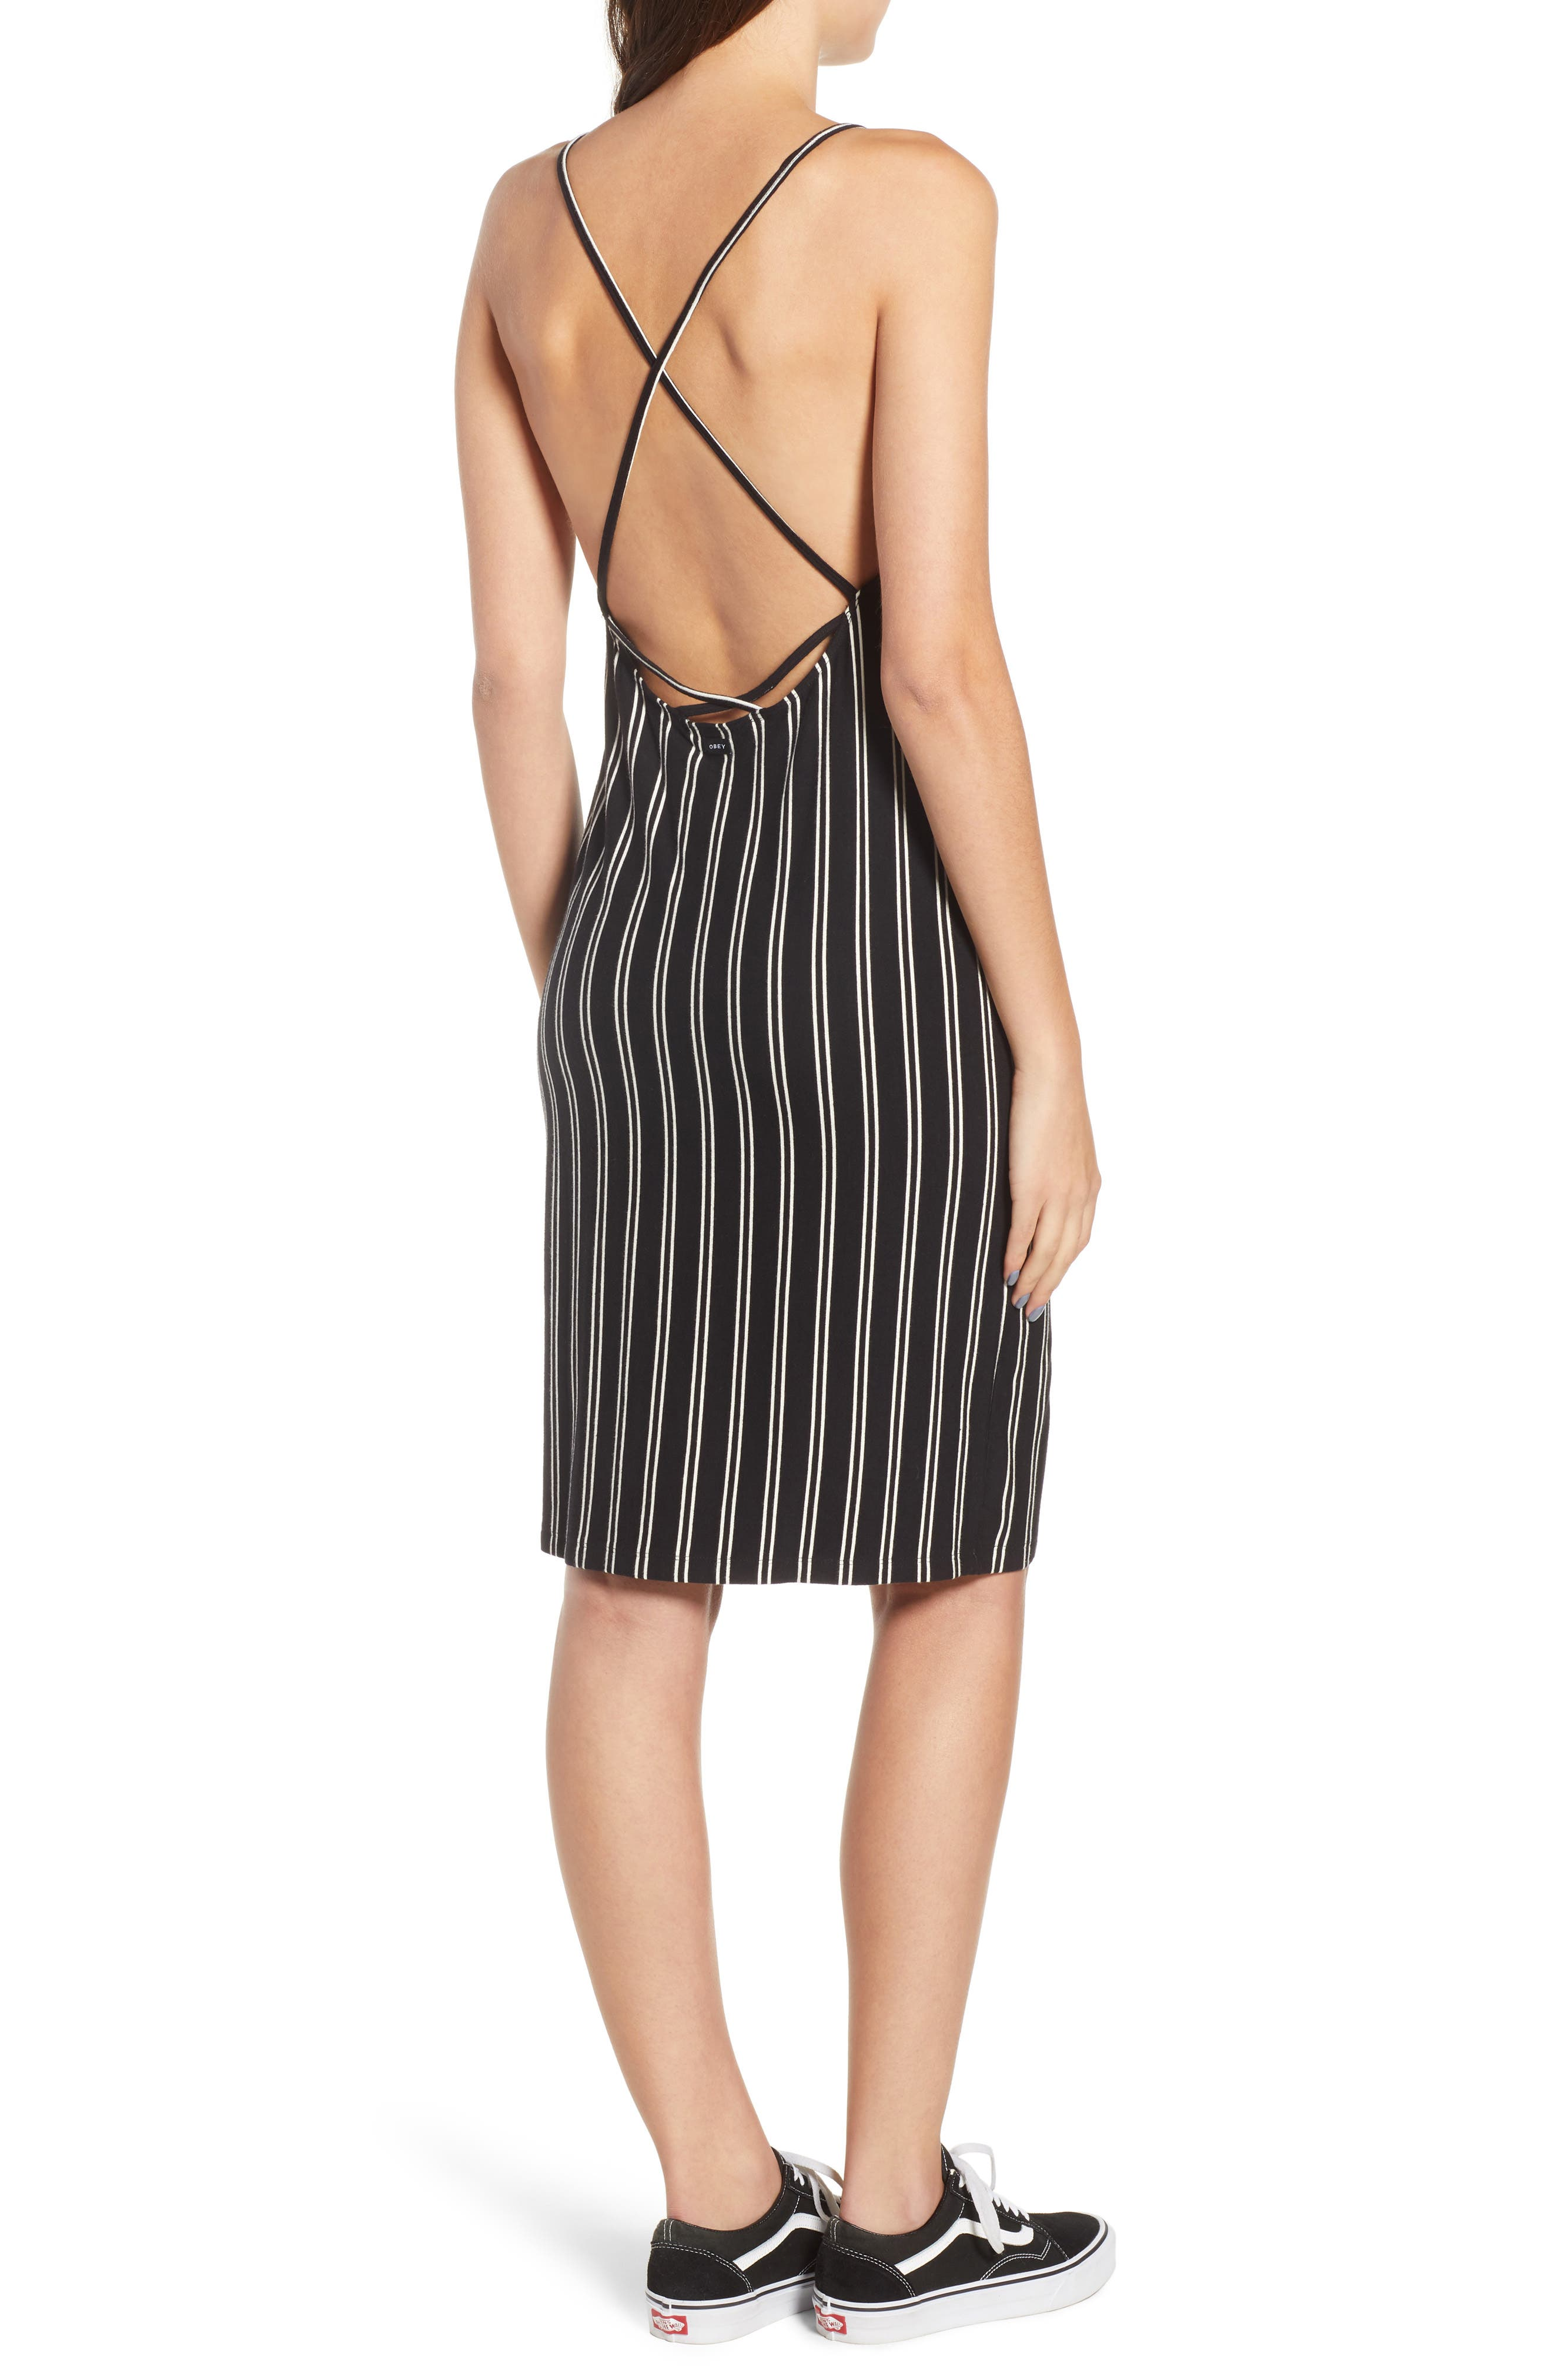 Lockette Strappy Striped Dress,                             Alternate thumbnail 2, color,                             005